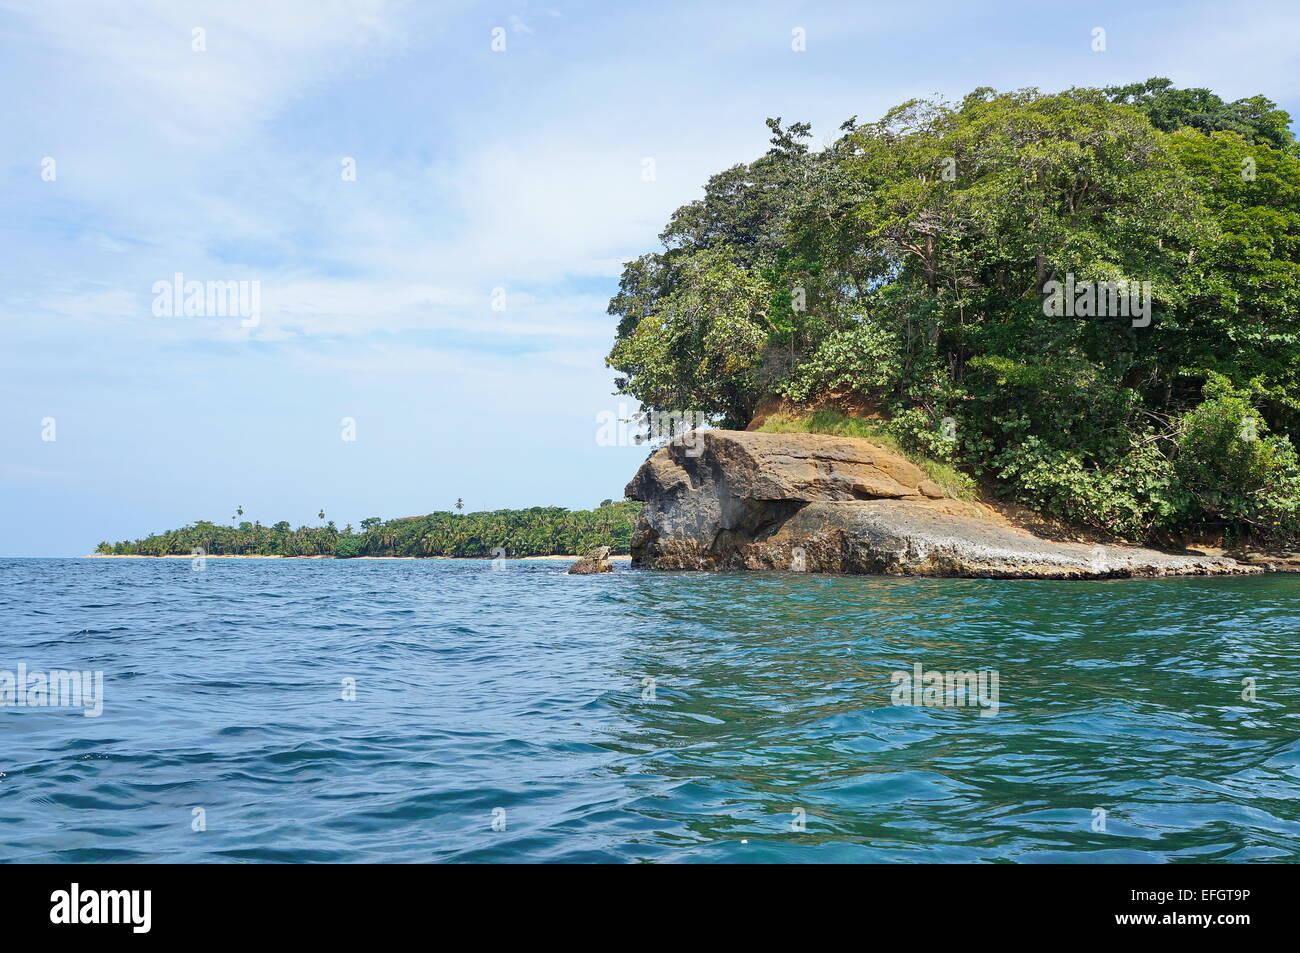 Punta Uva in Costa Rica on the Caribbean coast near Puerto Viejo de Talamanca, Central America - Stock Image